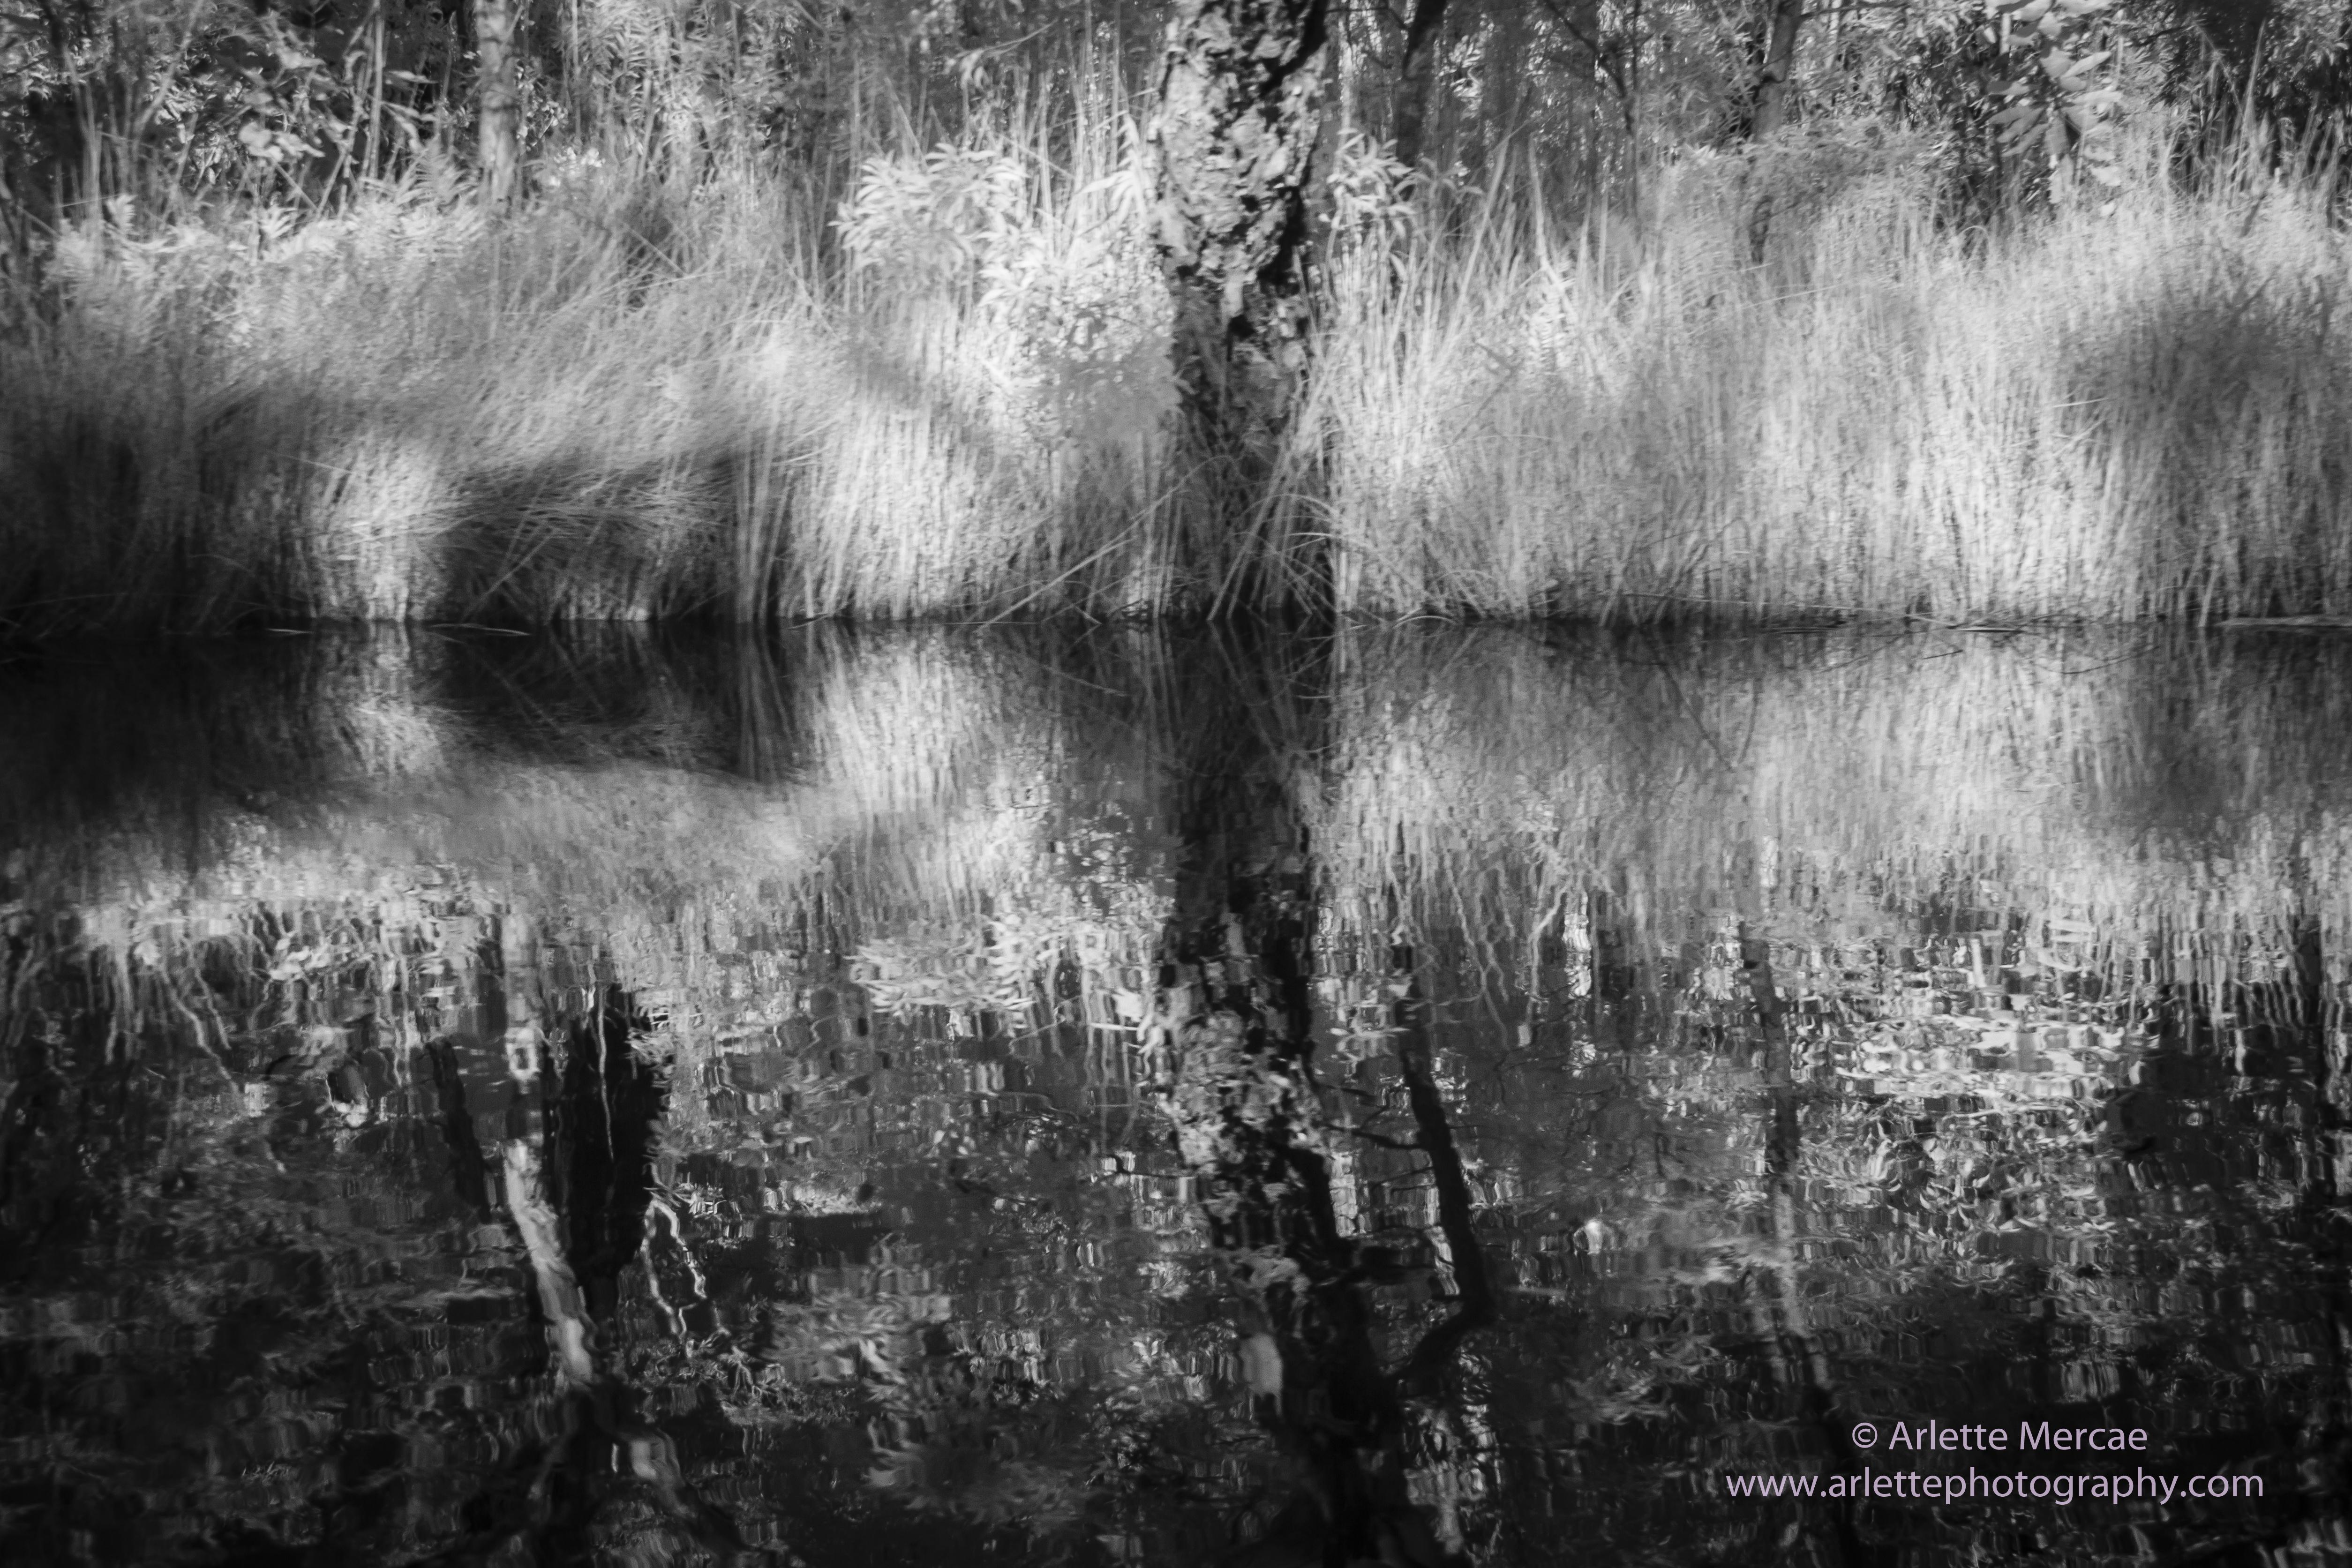 Noosa Everglades - 19